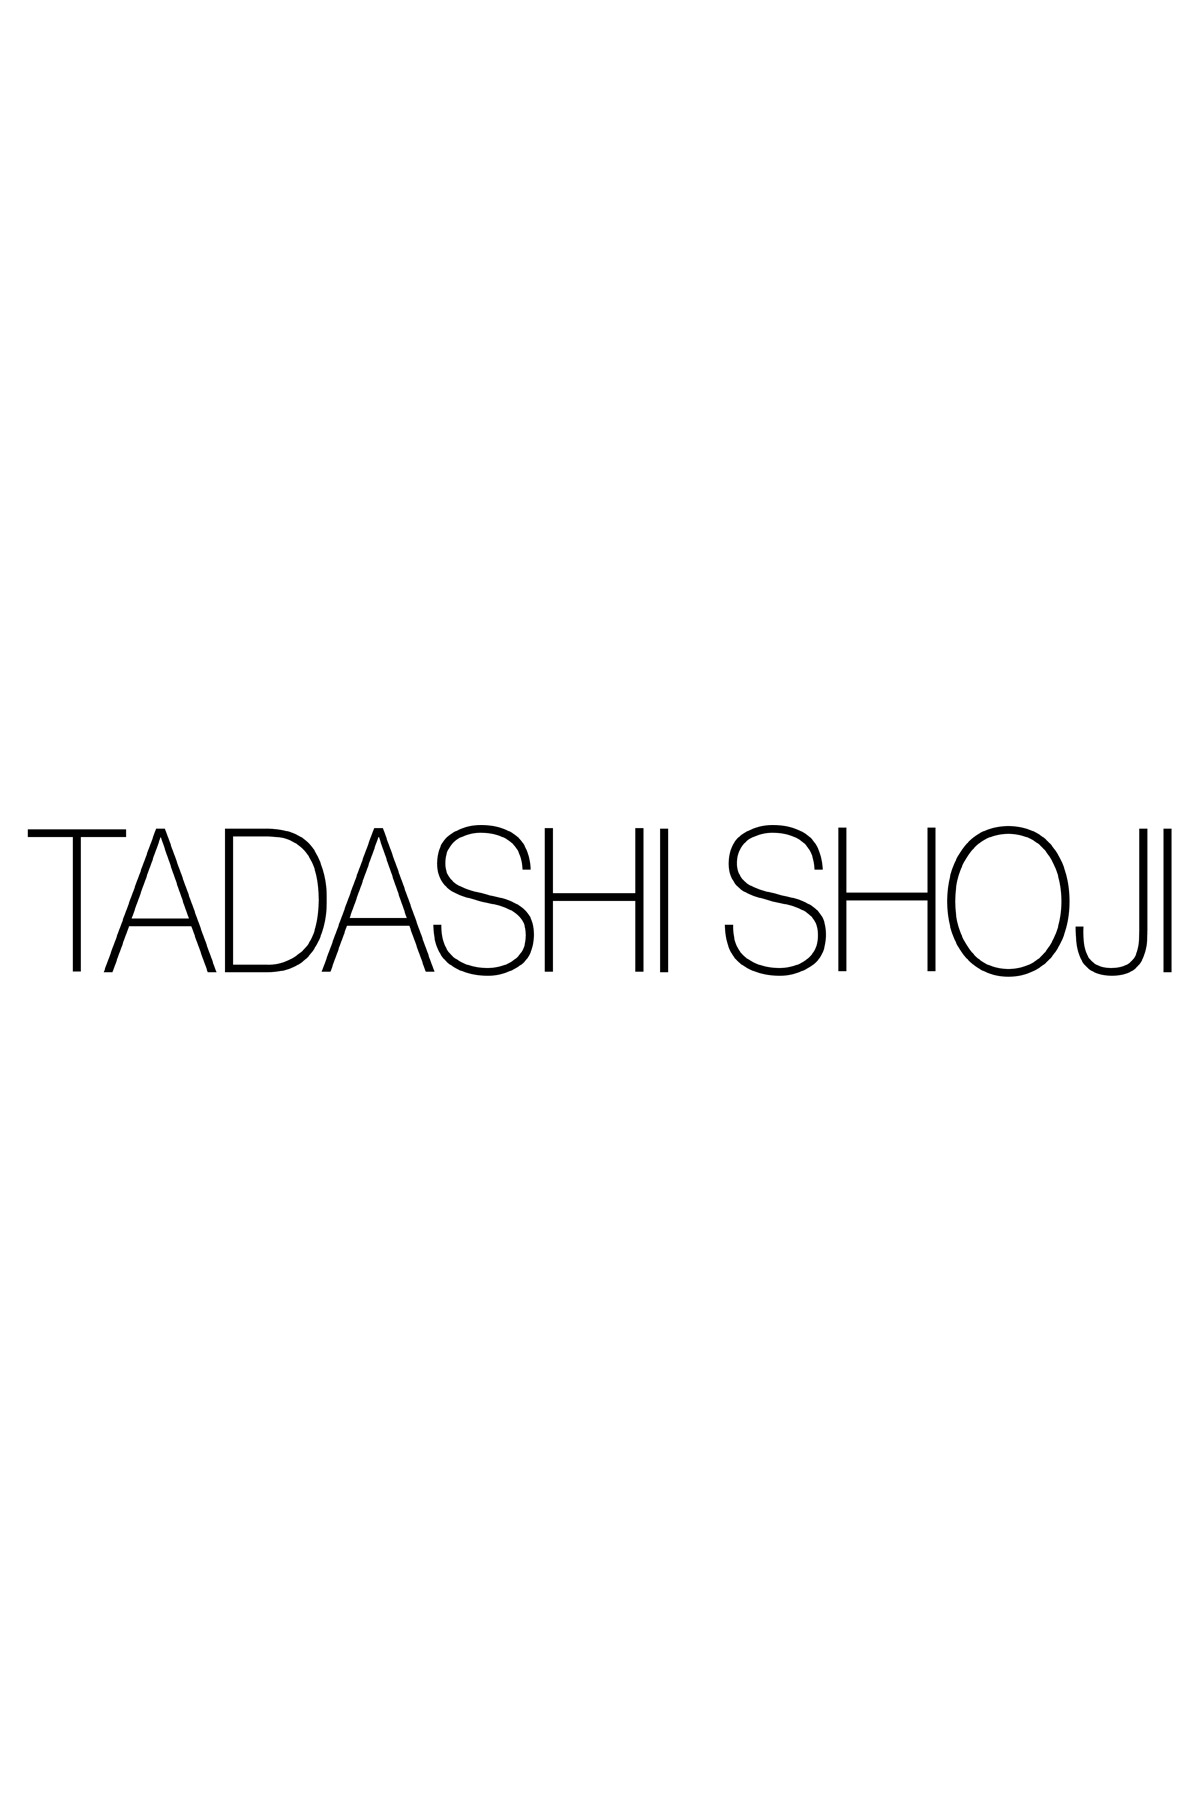 Tadashi Shoji - Indigo Floral Neoprene Dress - PLUS SIZE